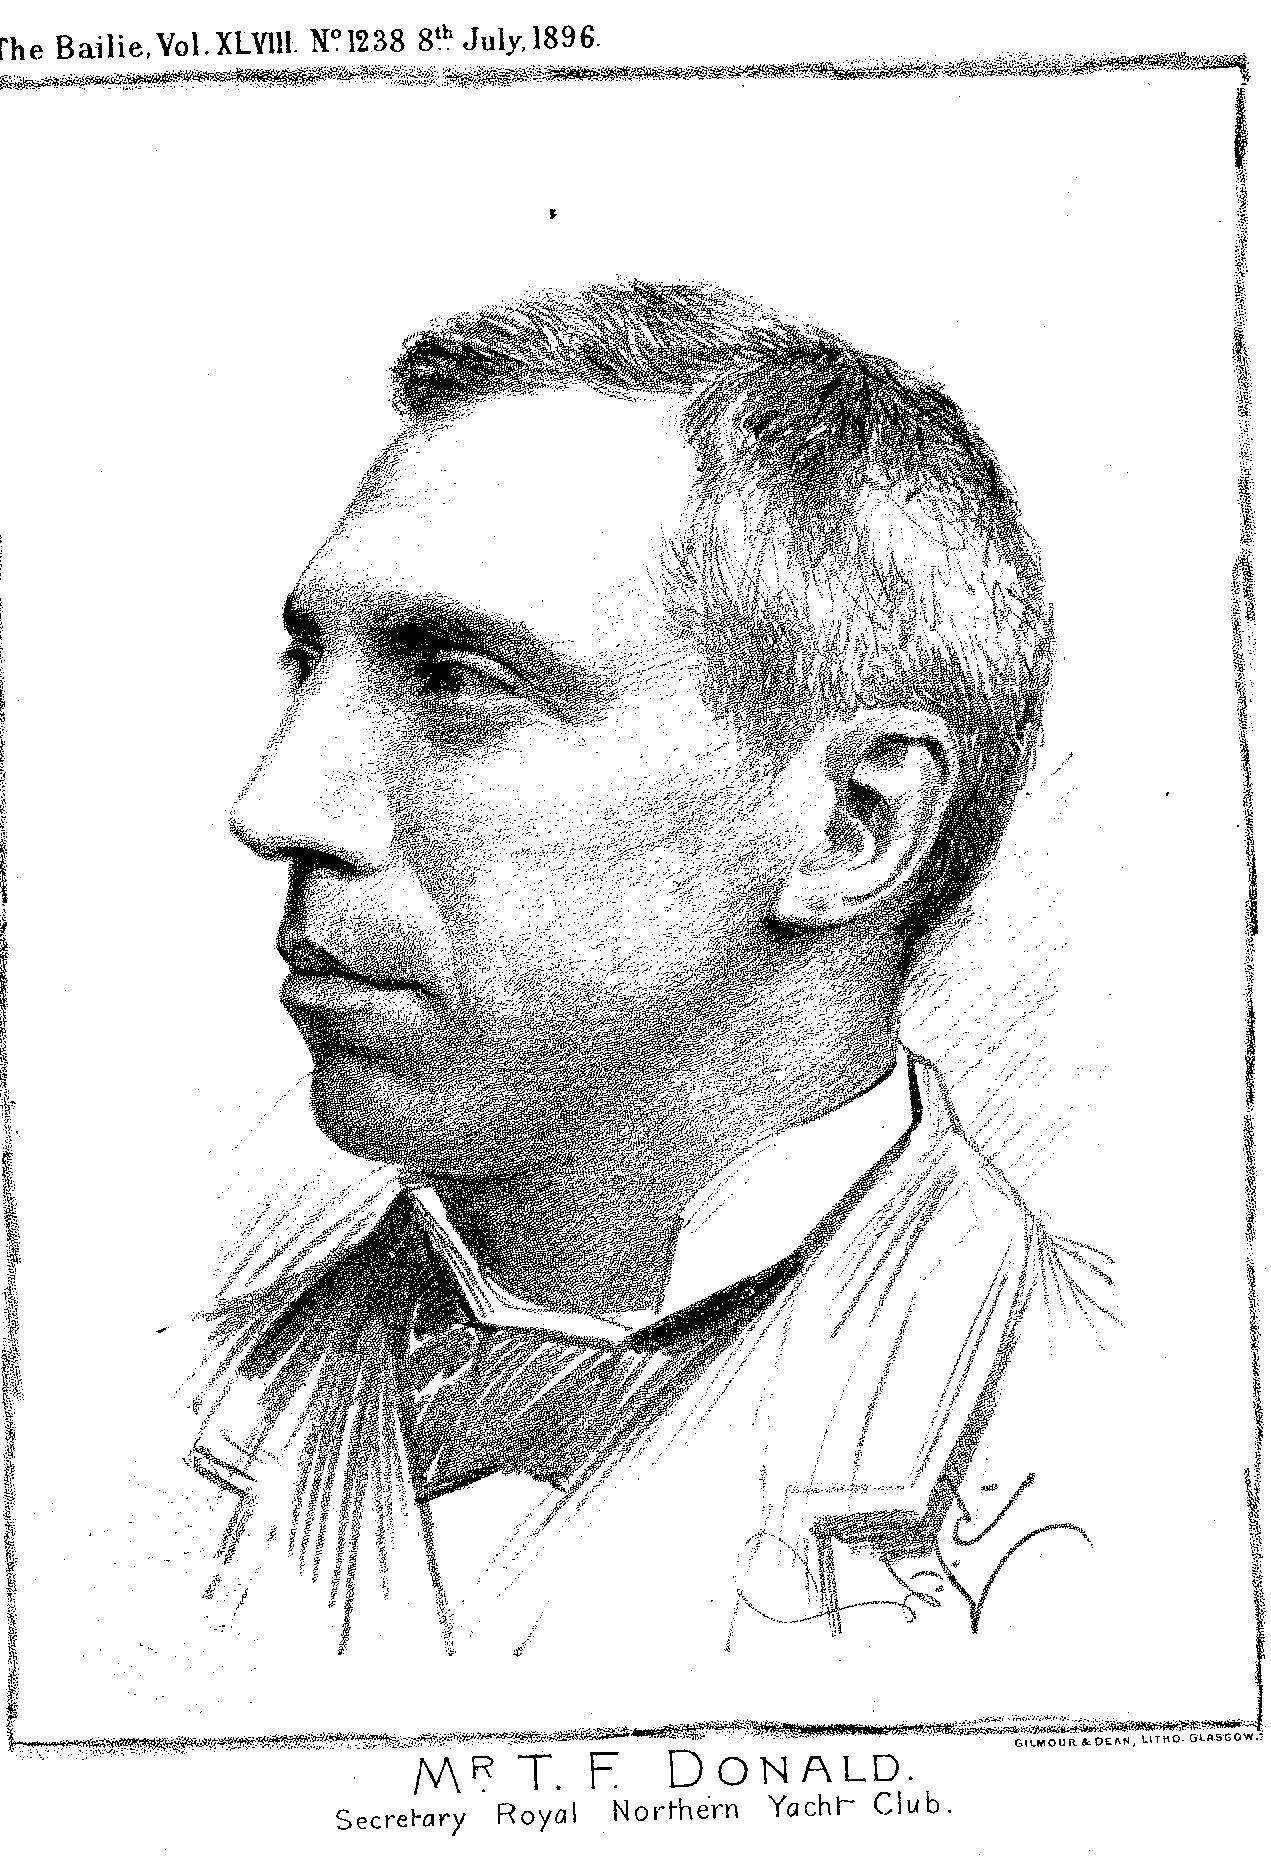 Thomas Francis Donald